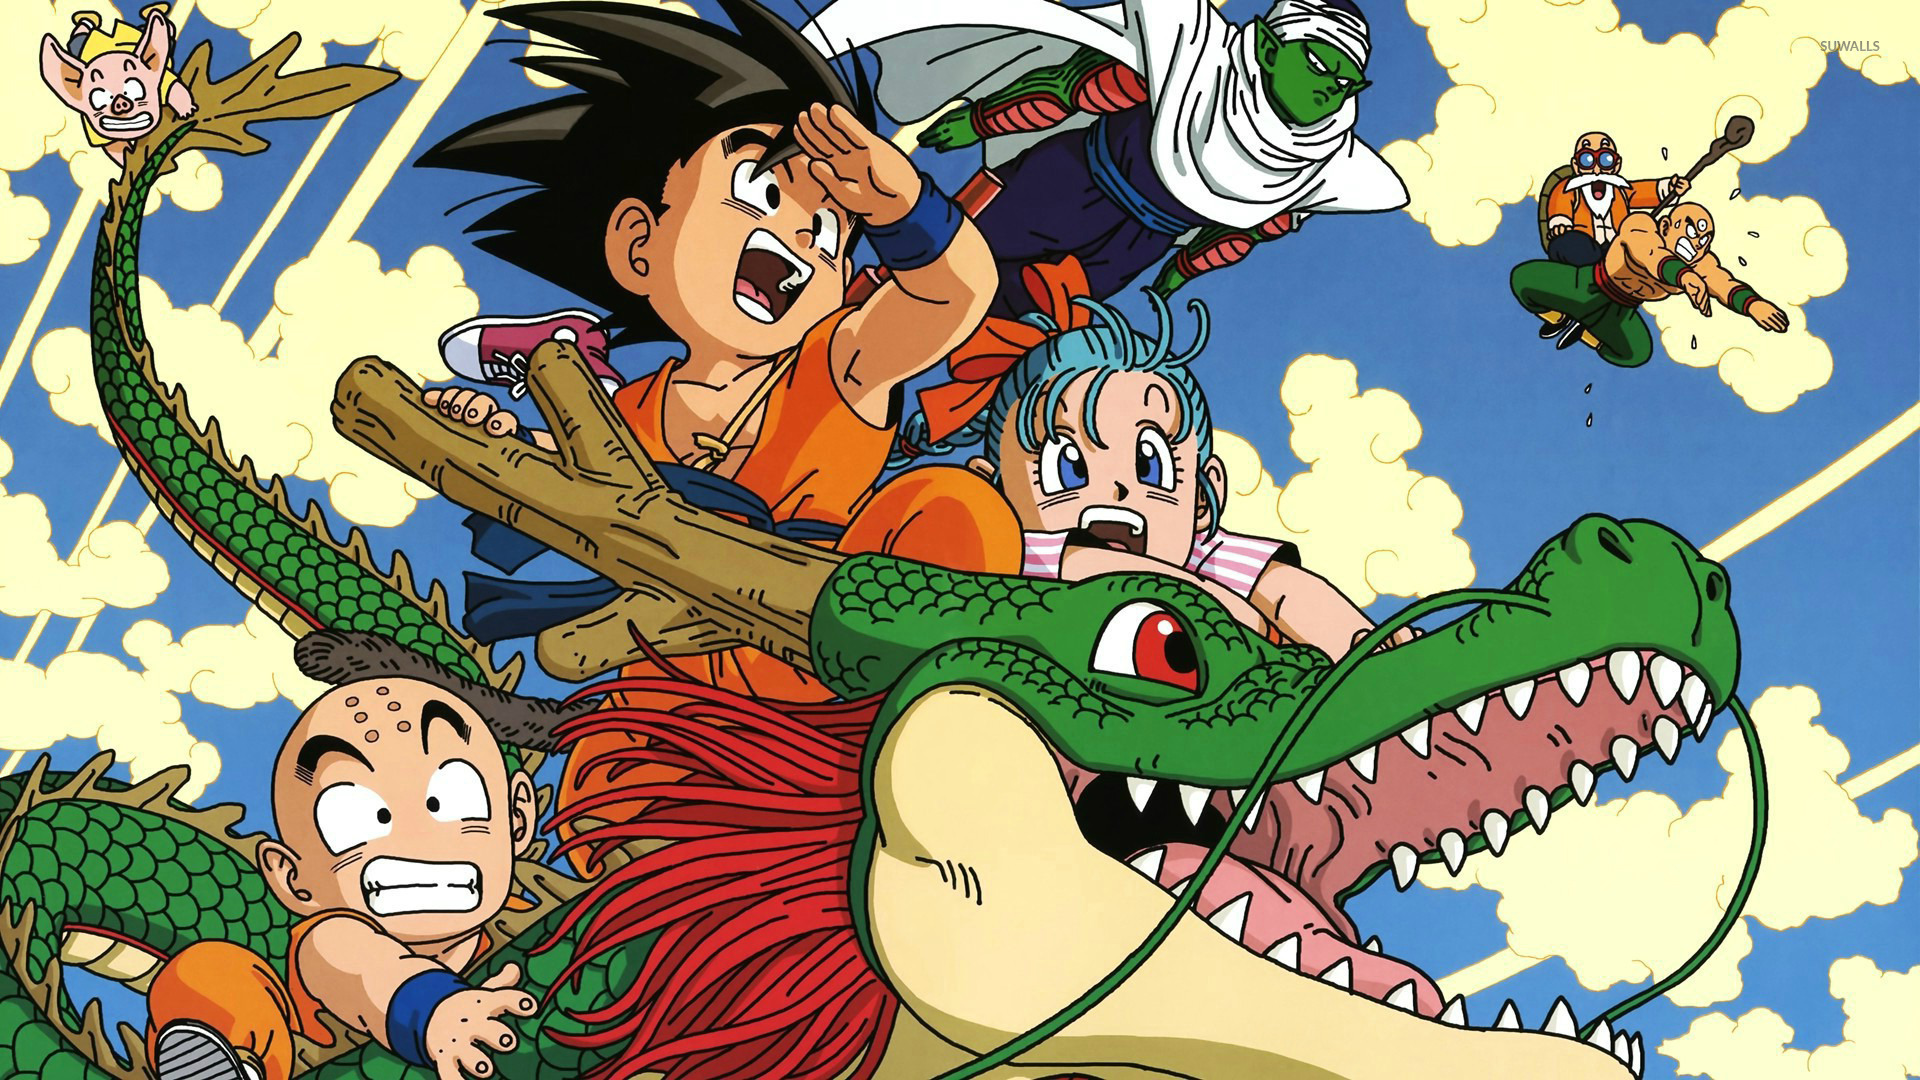 Dragon Ball Z 7 wallpaper Anime wallpapers 15389